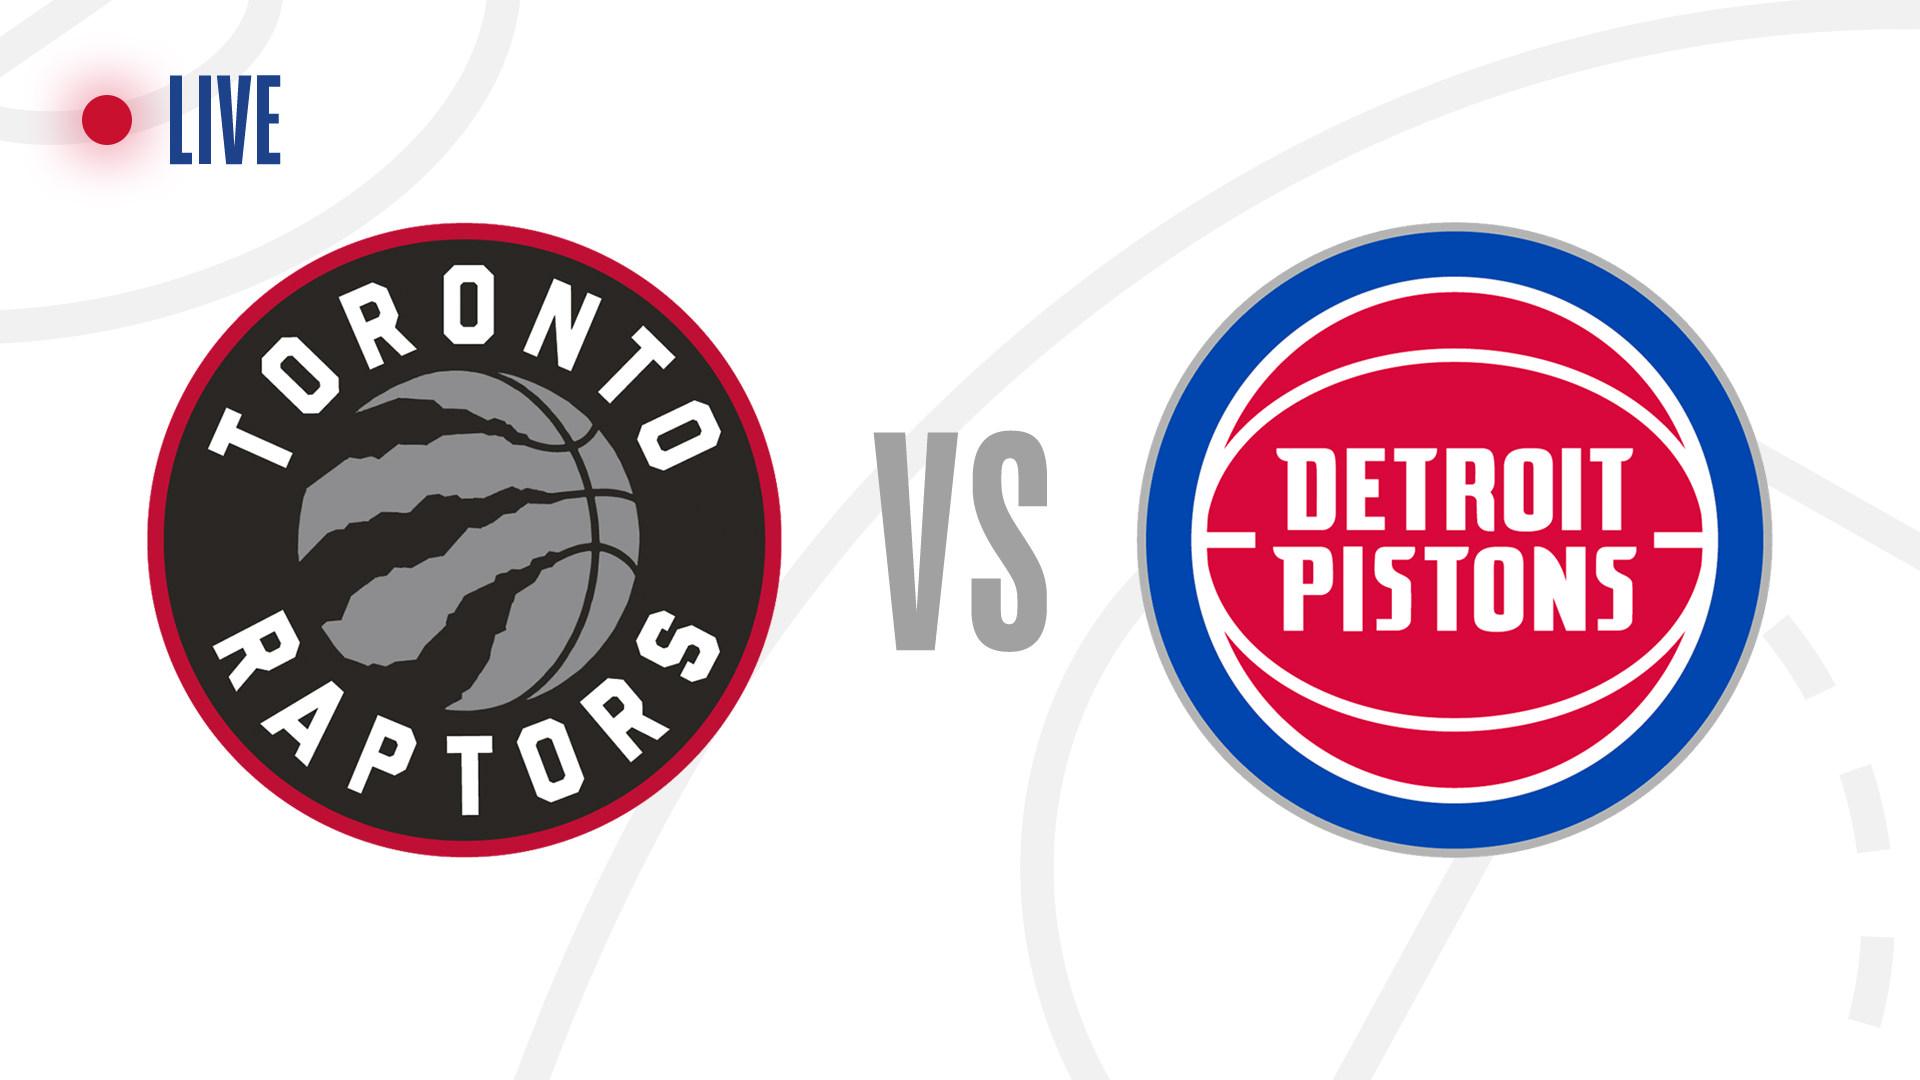 Toronto Raptors Vs Detroit Pistons Live Updates